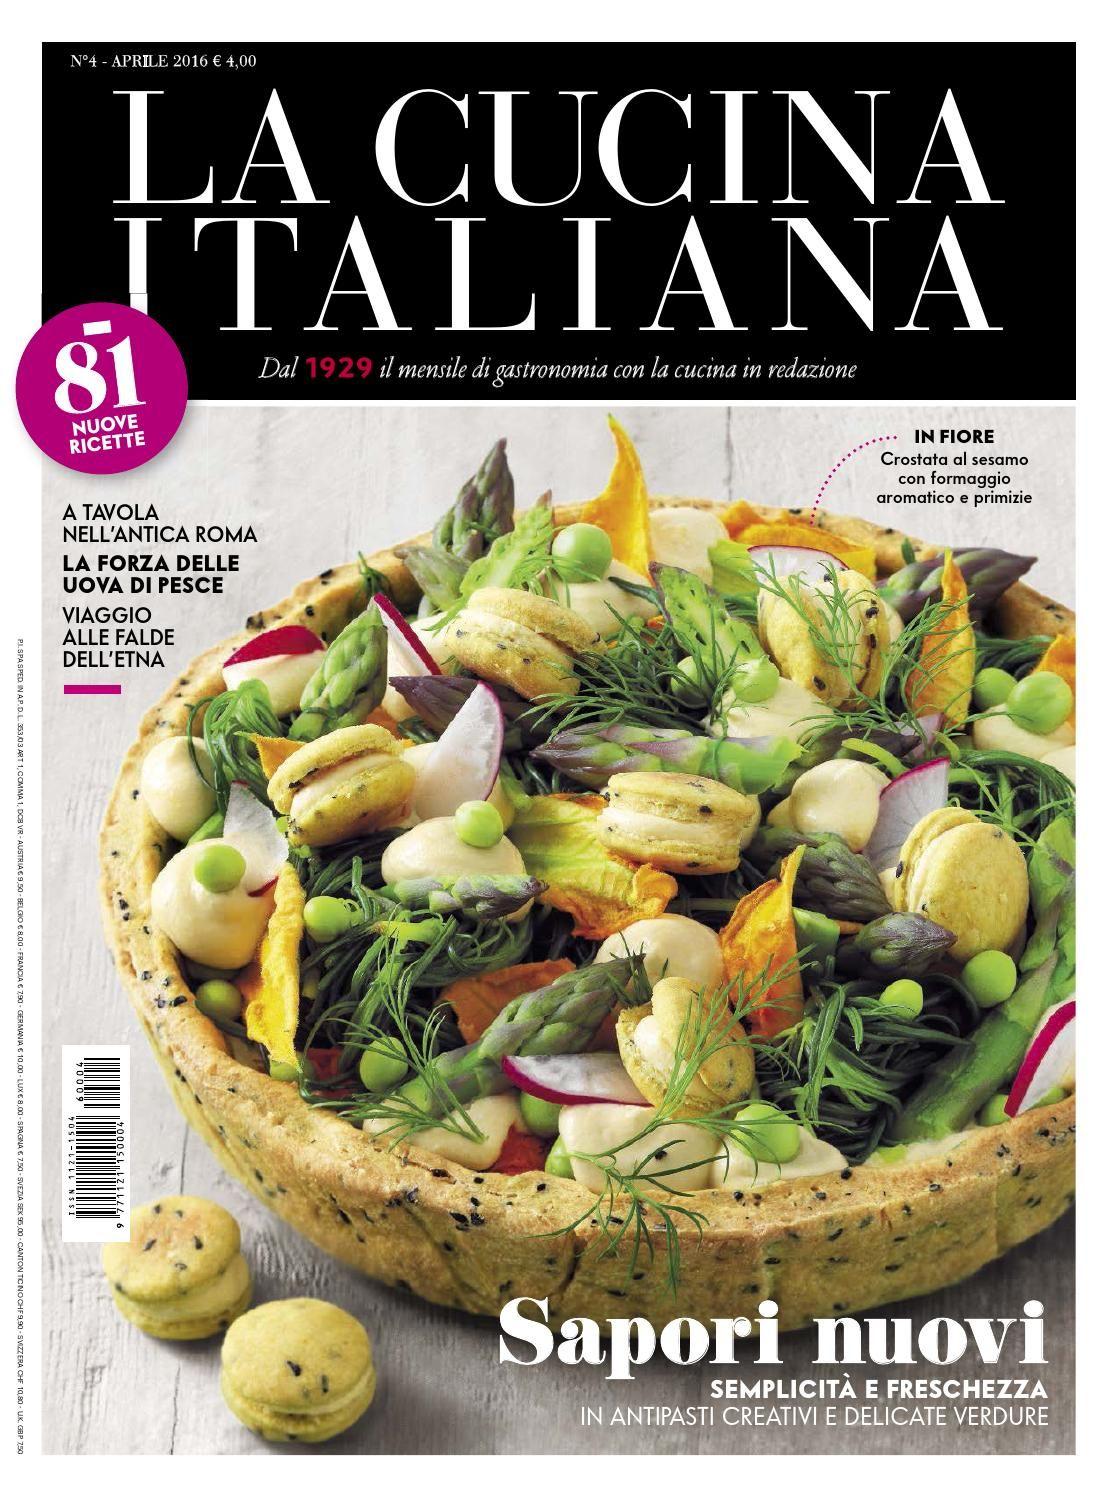 c06a7c25b5a56bdd6f1d5e145fd499da - La Cucina Italiana Ricette